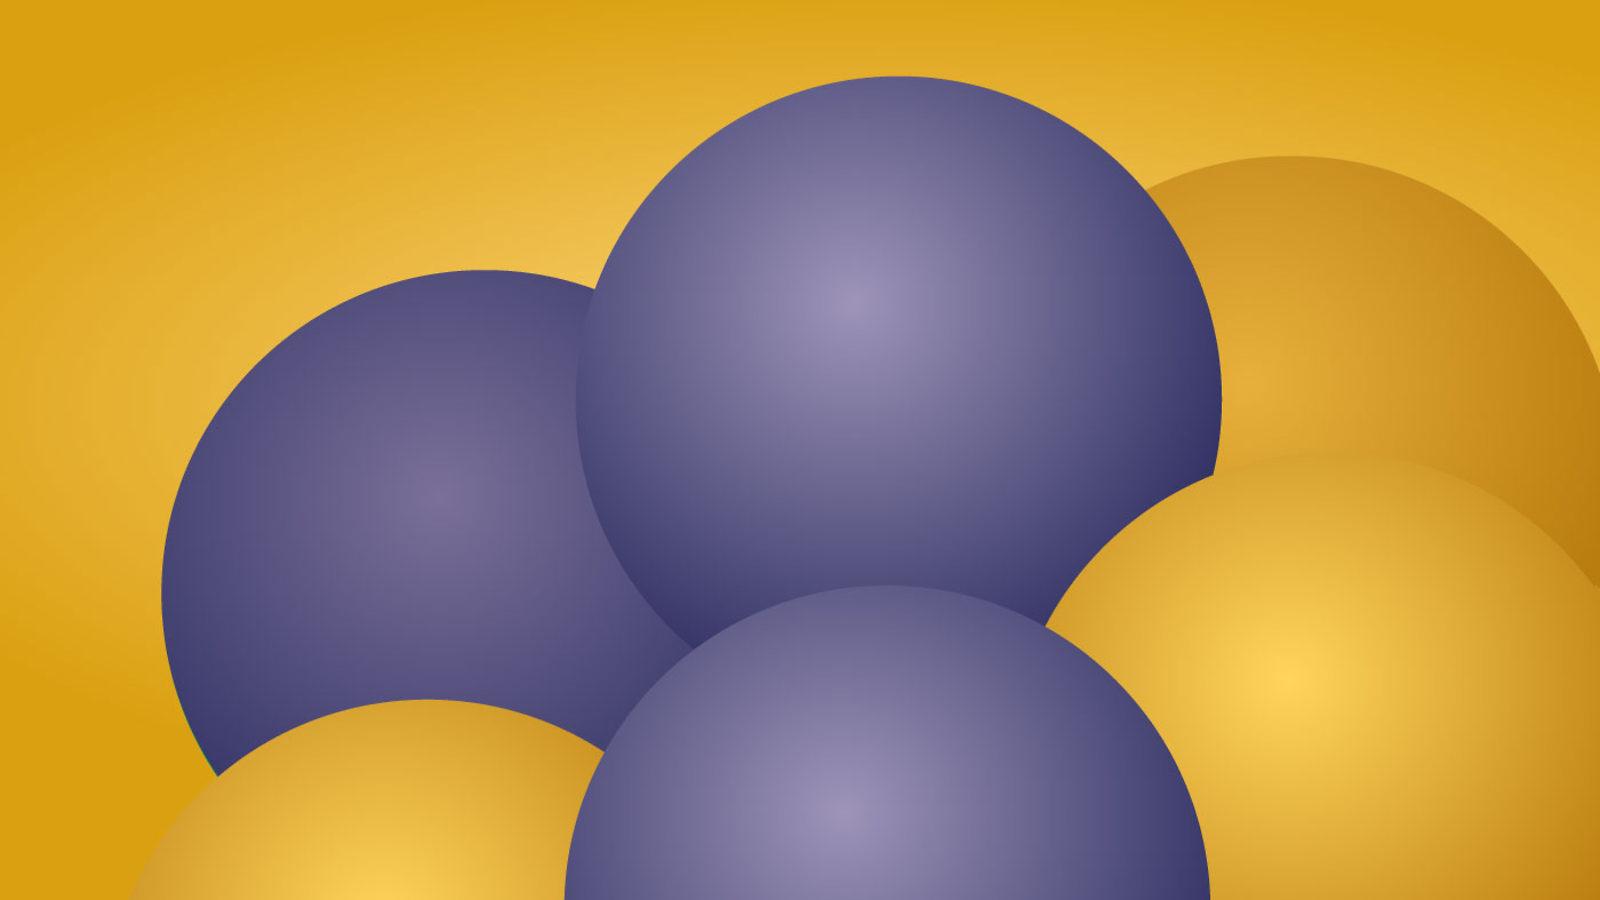 Image of the yellow and blue E=mc2 balls